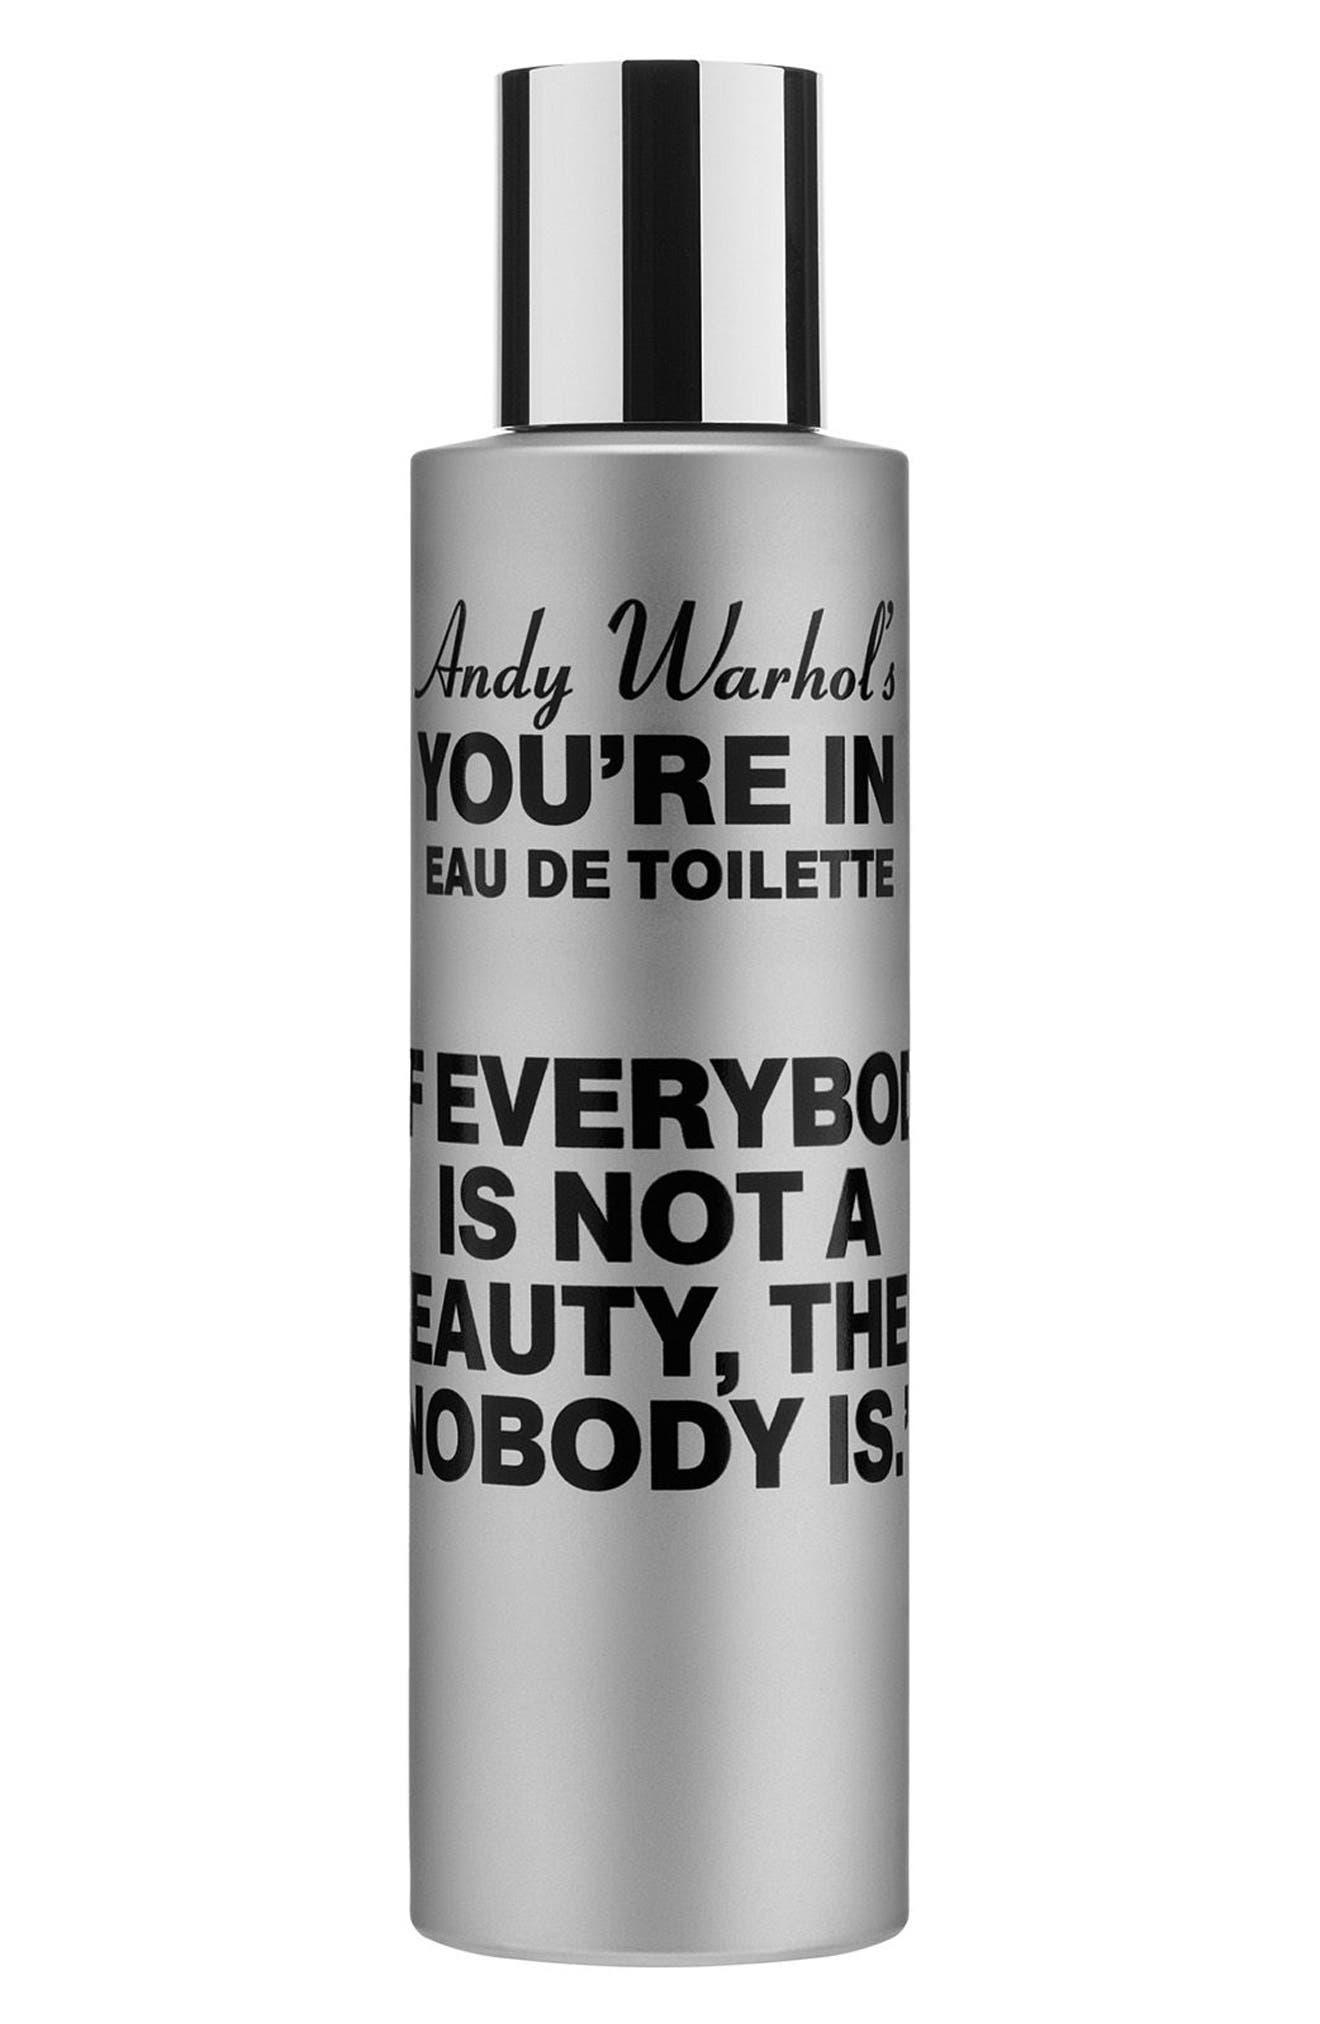 COMME DES GARÇONS Andy Warhol You're In Unisex Eau de Toilette, Main, color, IF EVERYBODY IS